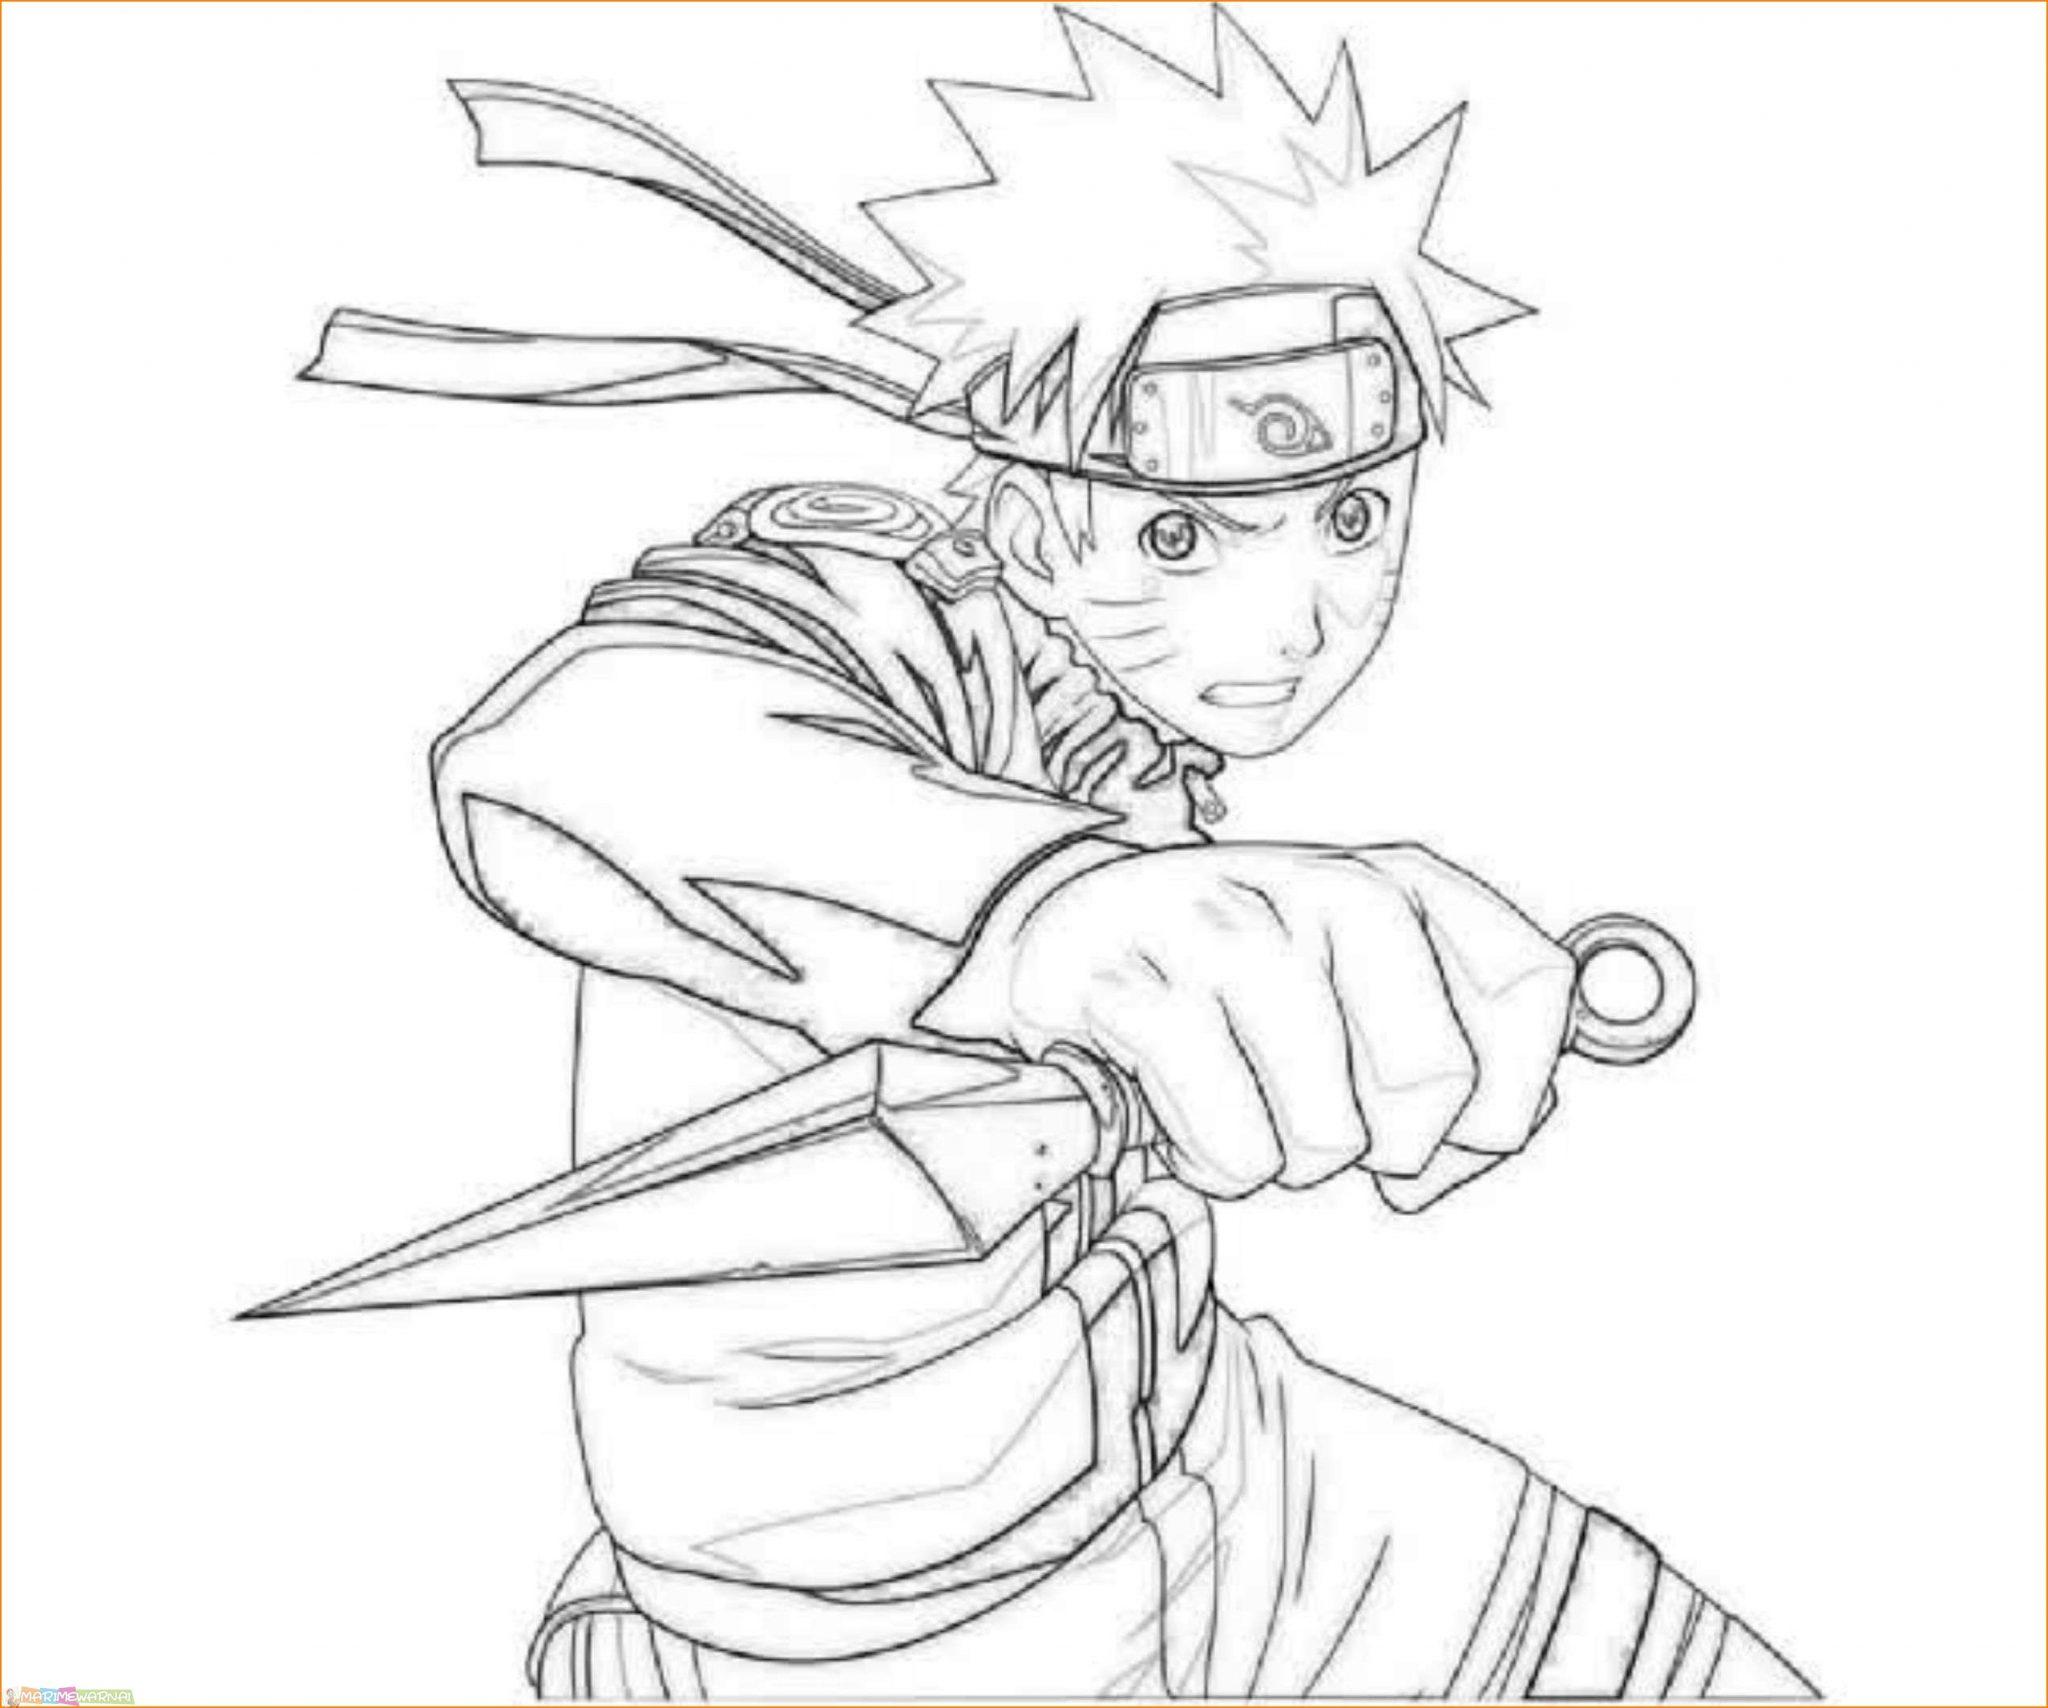 √20+ Gambar Mewarnai Naruto Terlengkap 2020 - Marimewarnai tout Dessin De Naruto